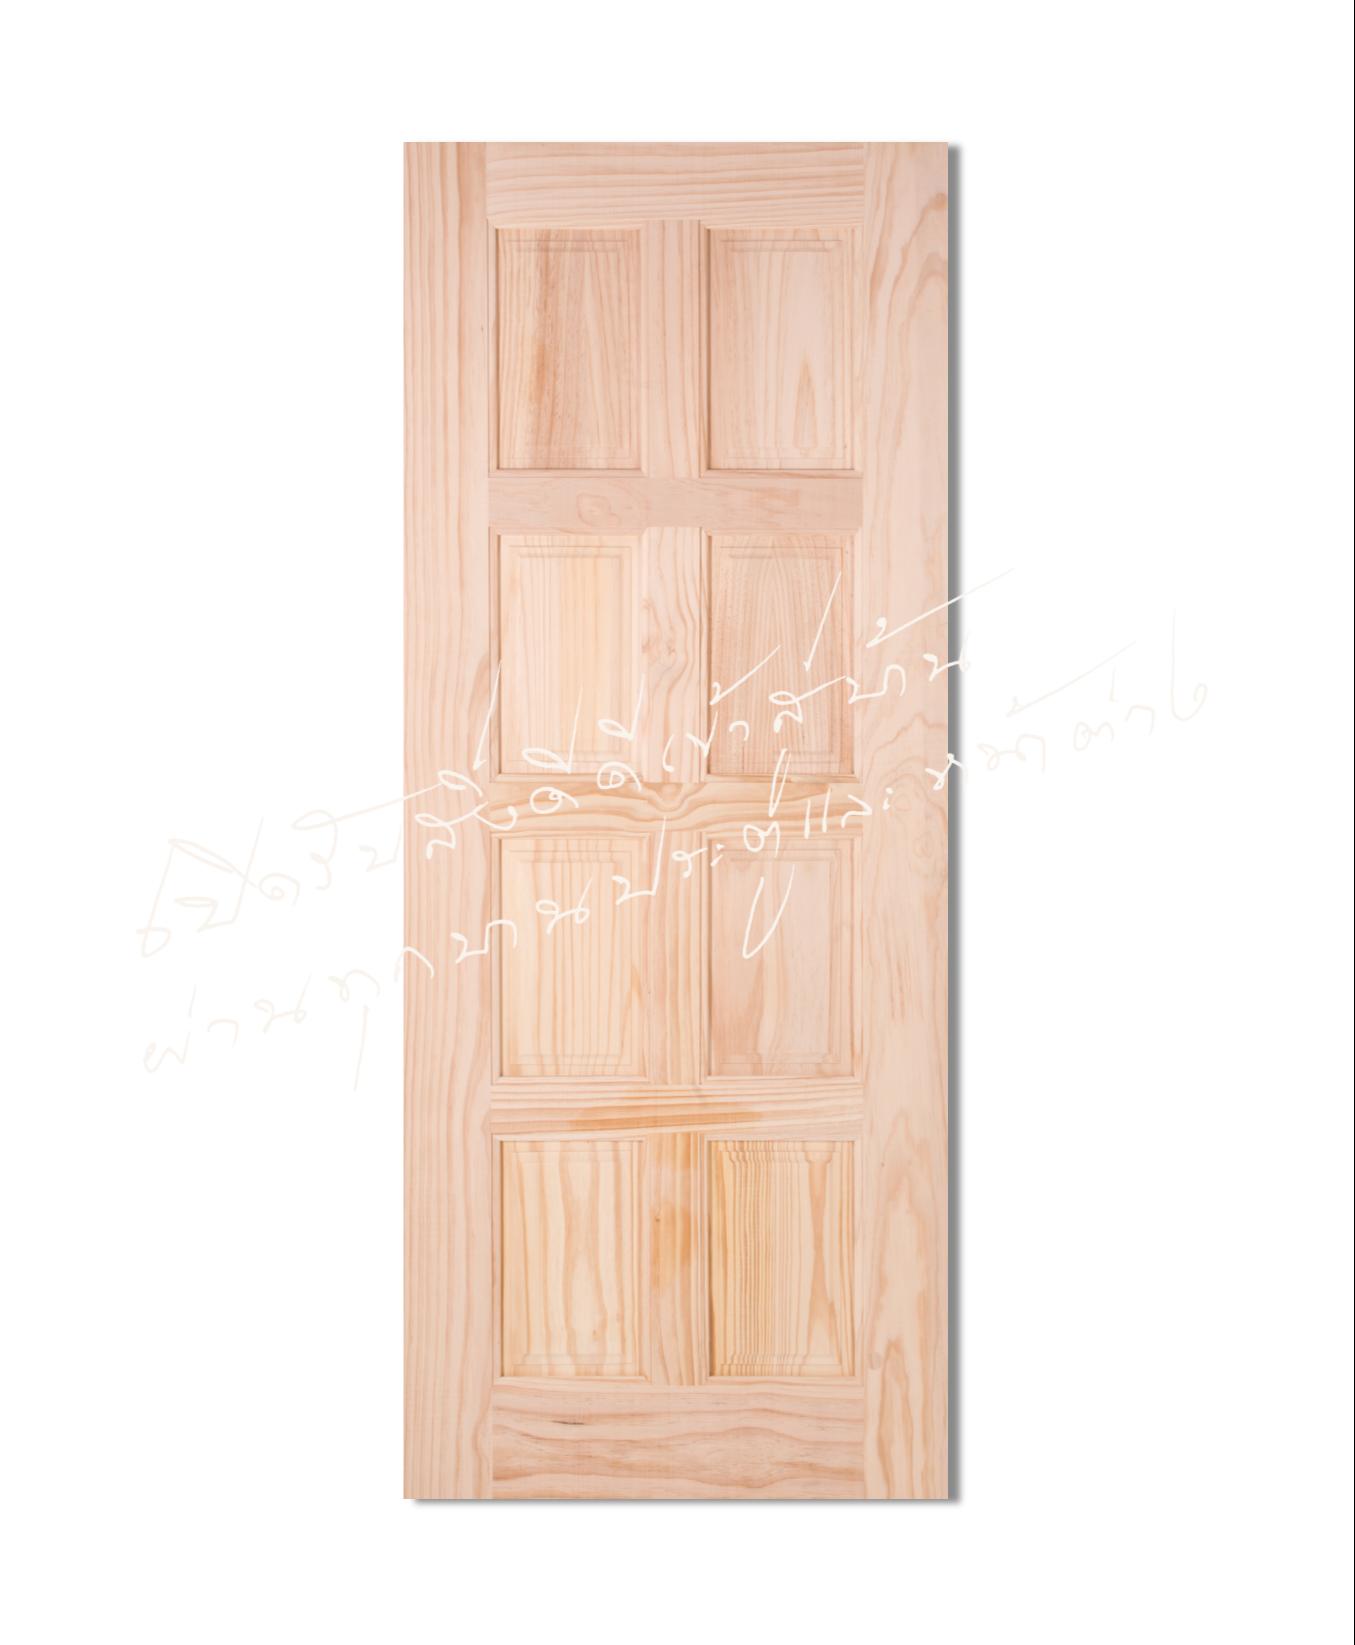 L116-8 ประตูไม้จริง ไม้สนนิวซีแลนด์